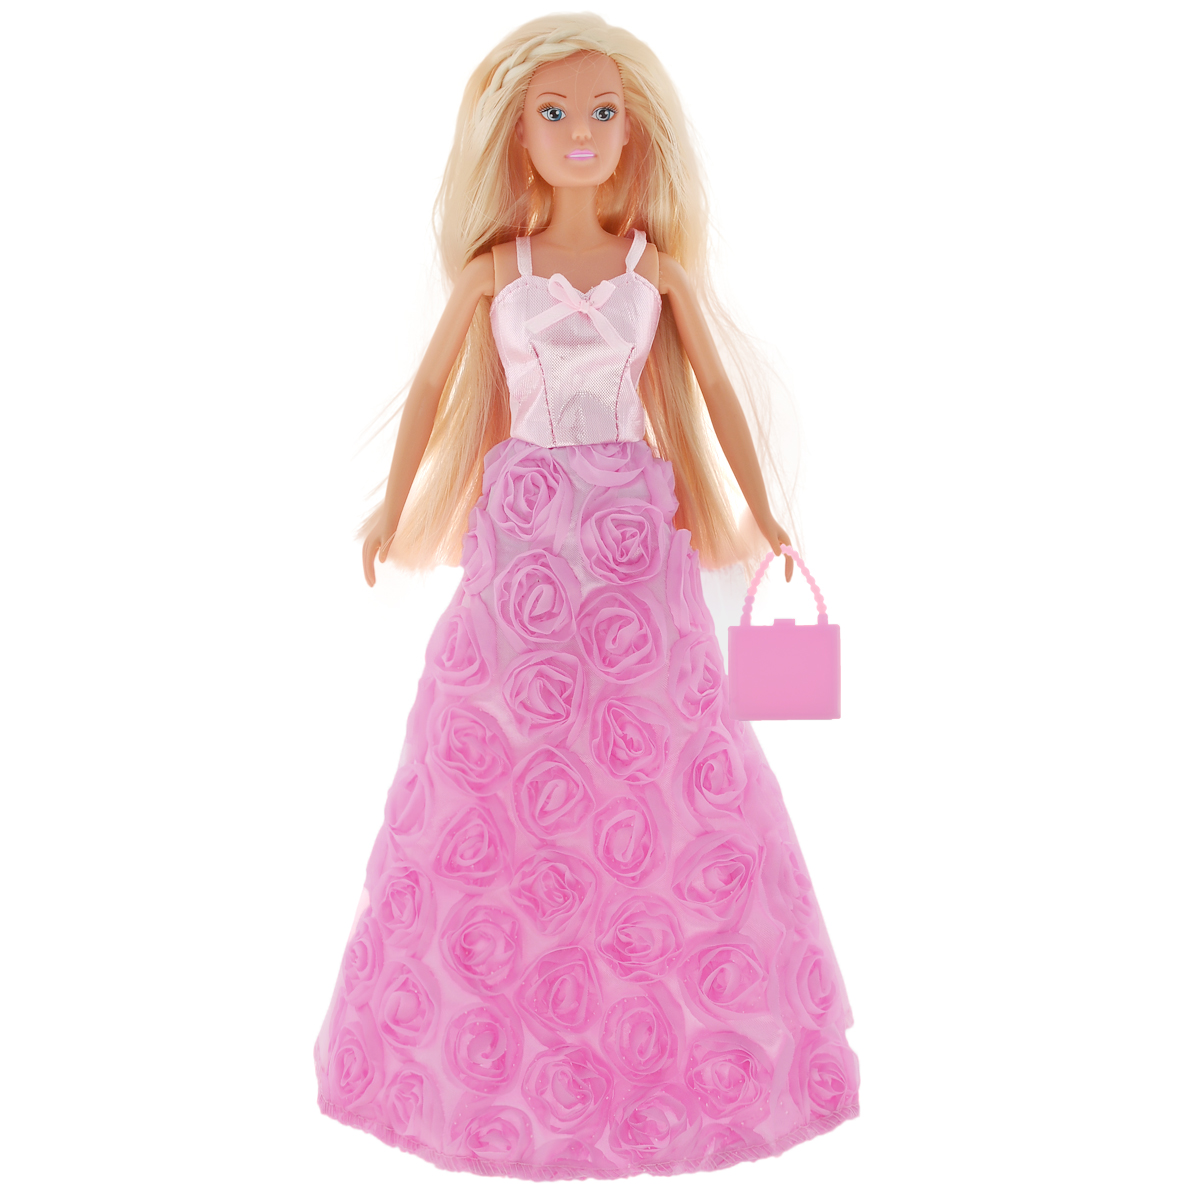 Девушка тортом, картинки красивые куклы штеффи принцесса